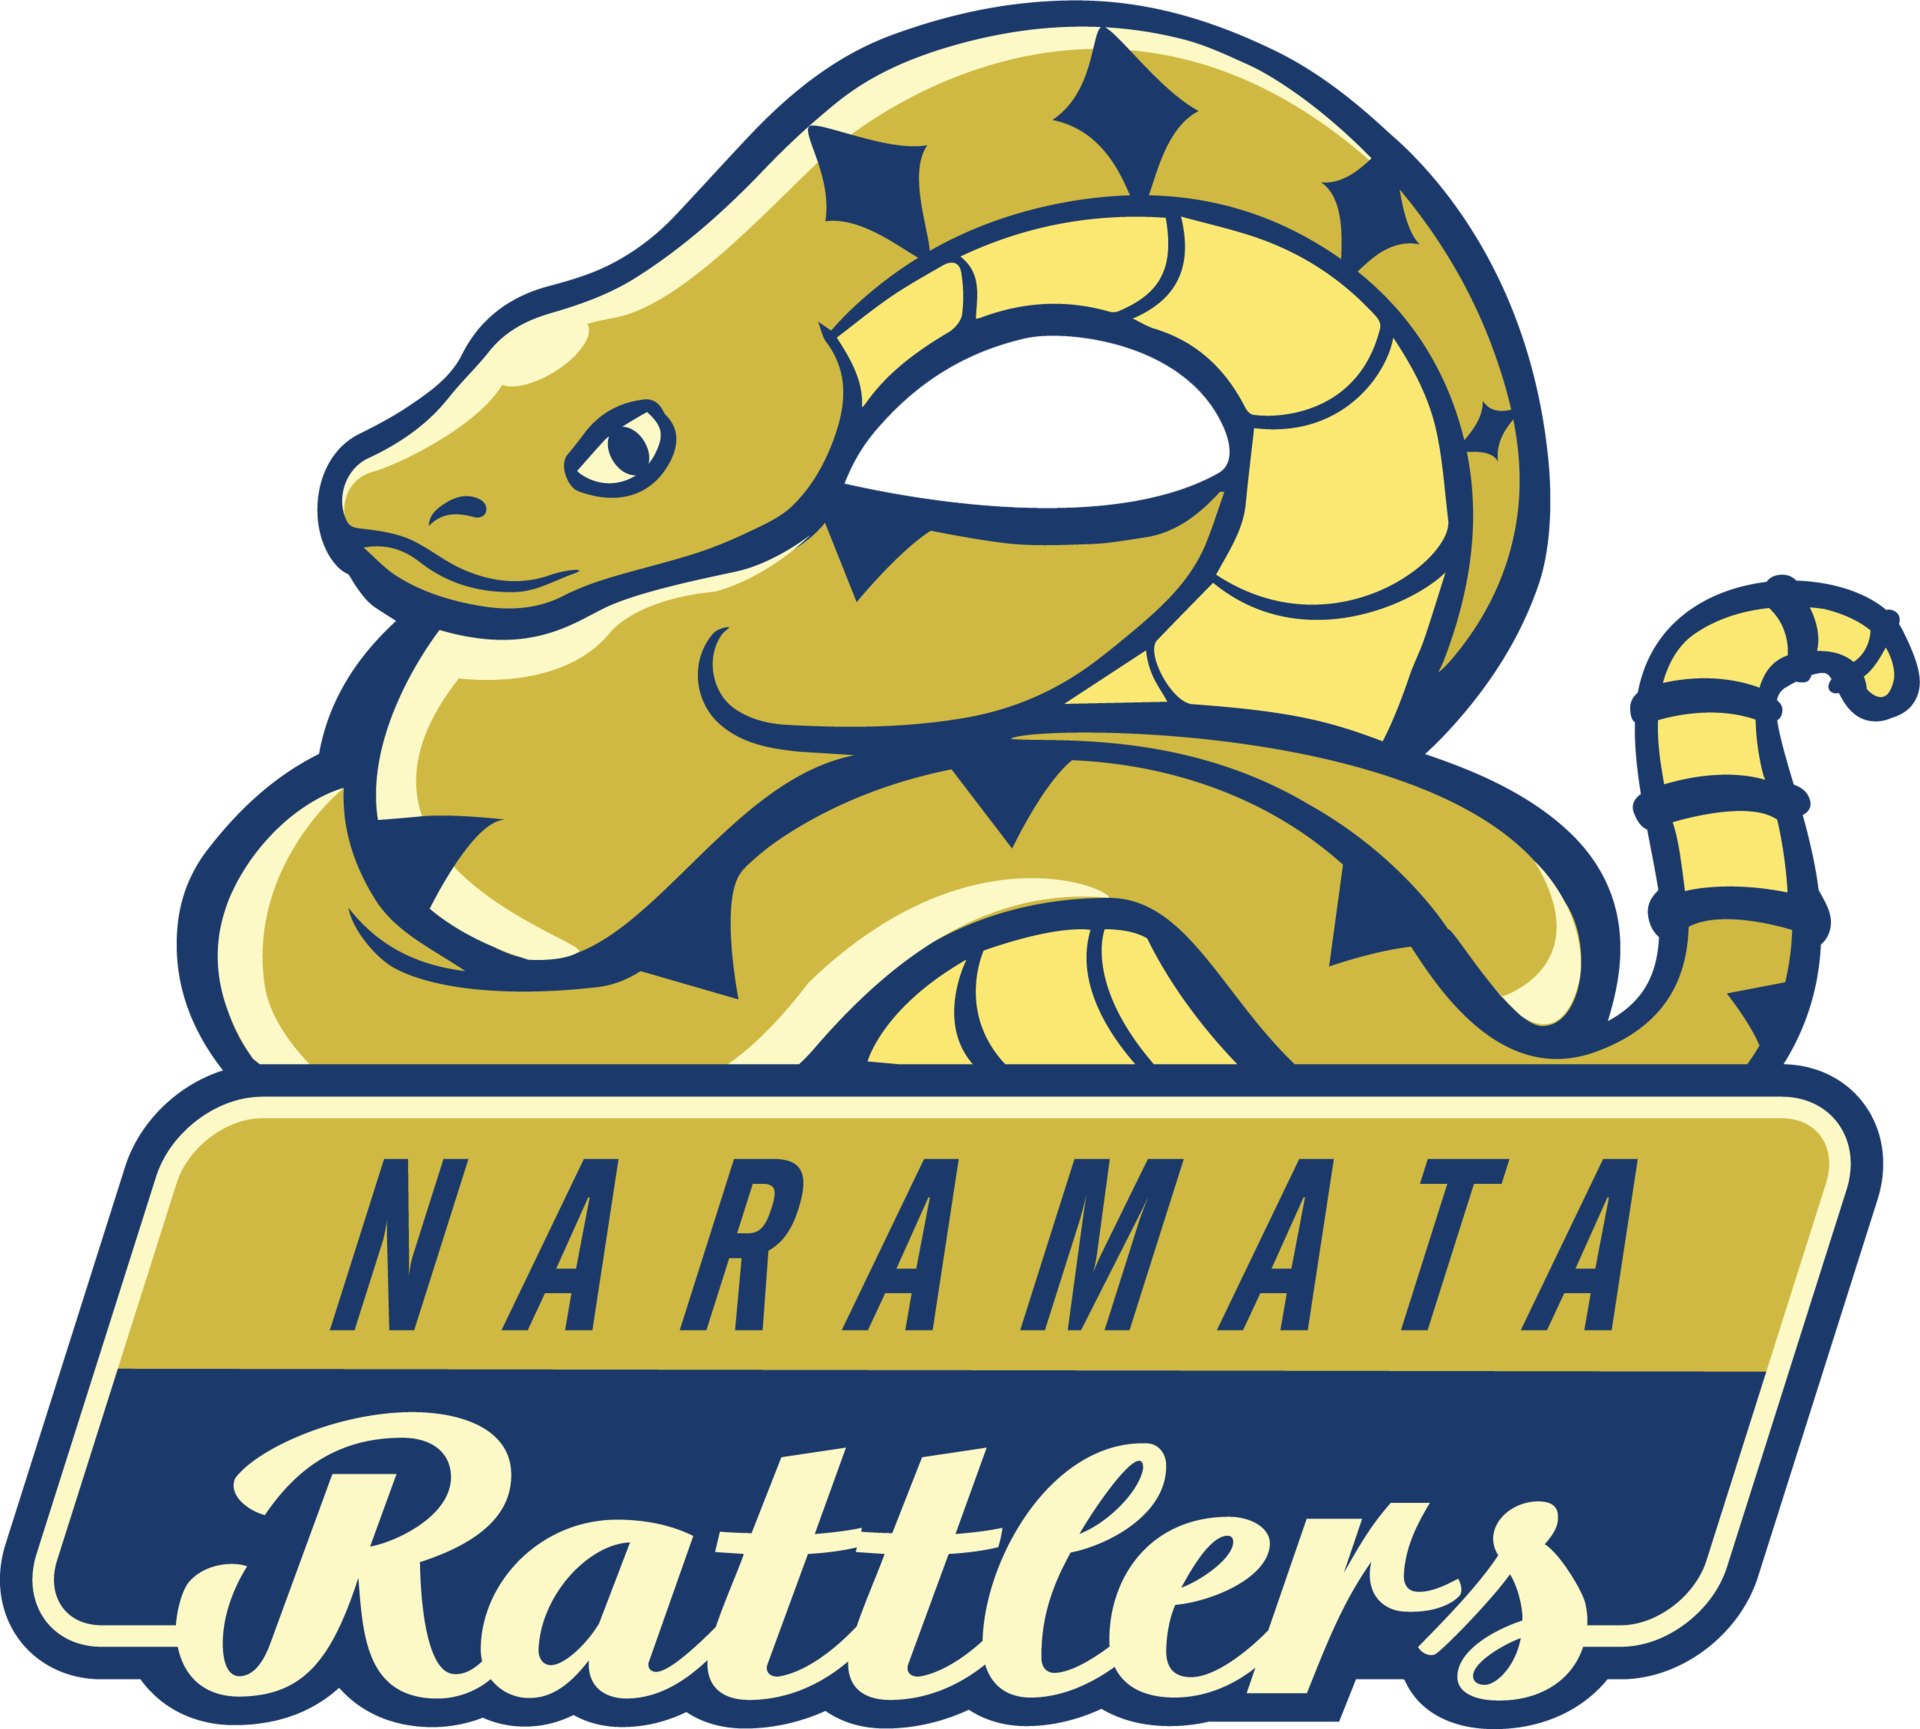 Naramata rattler logo